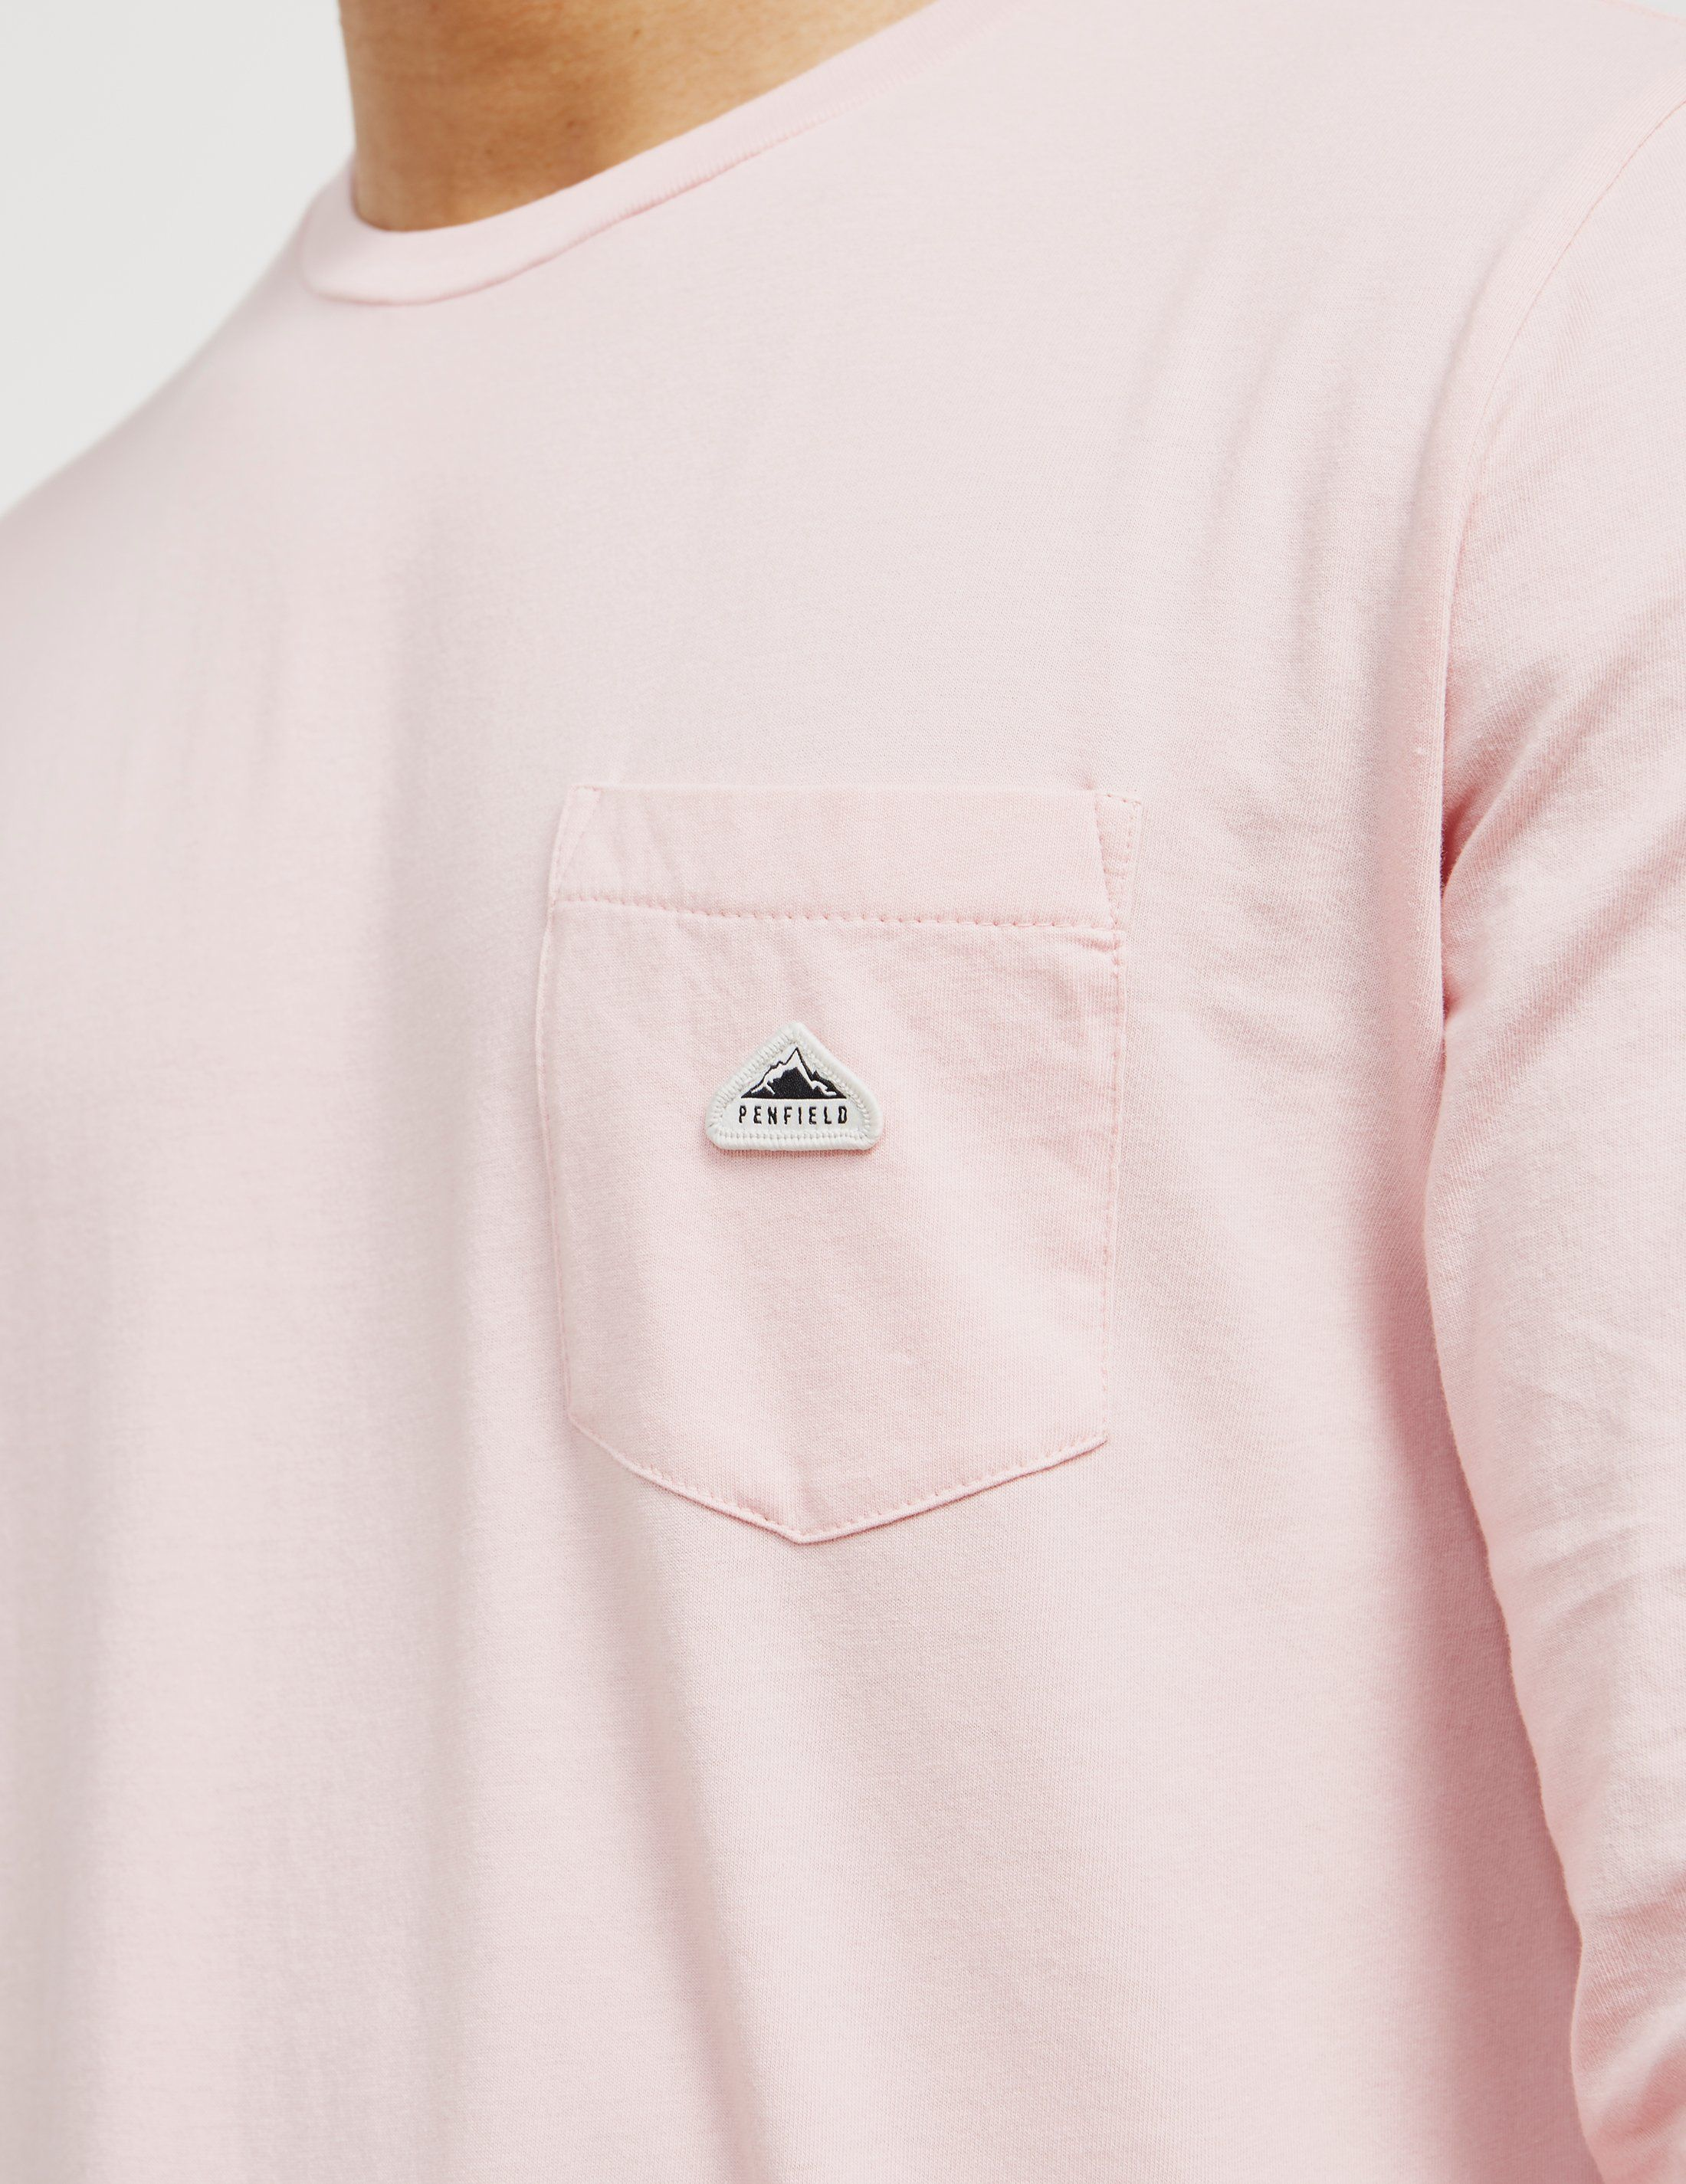 Penfield Friars Long Sleeve T-Shirt